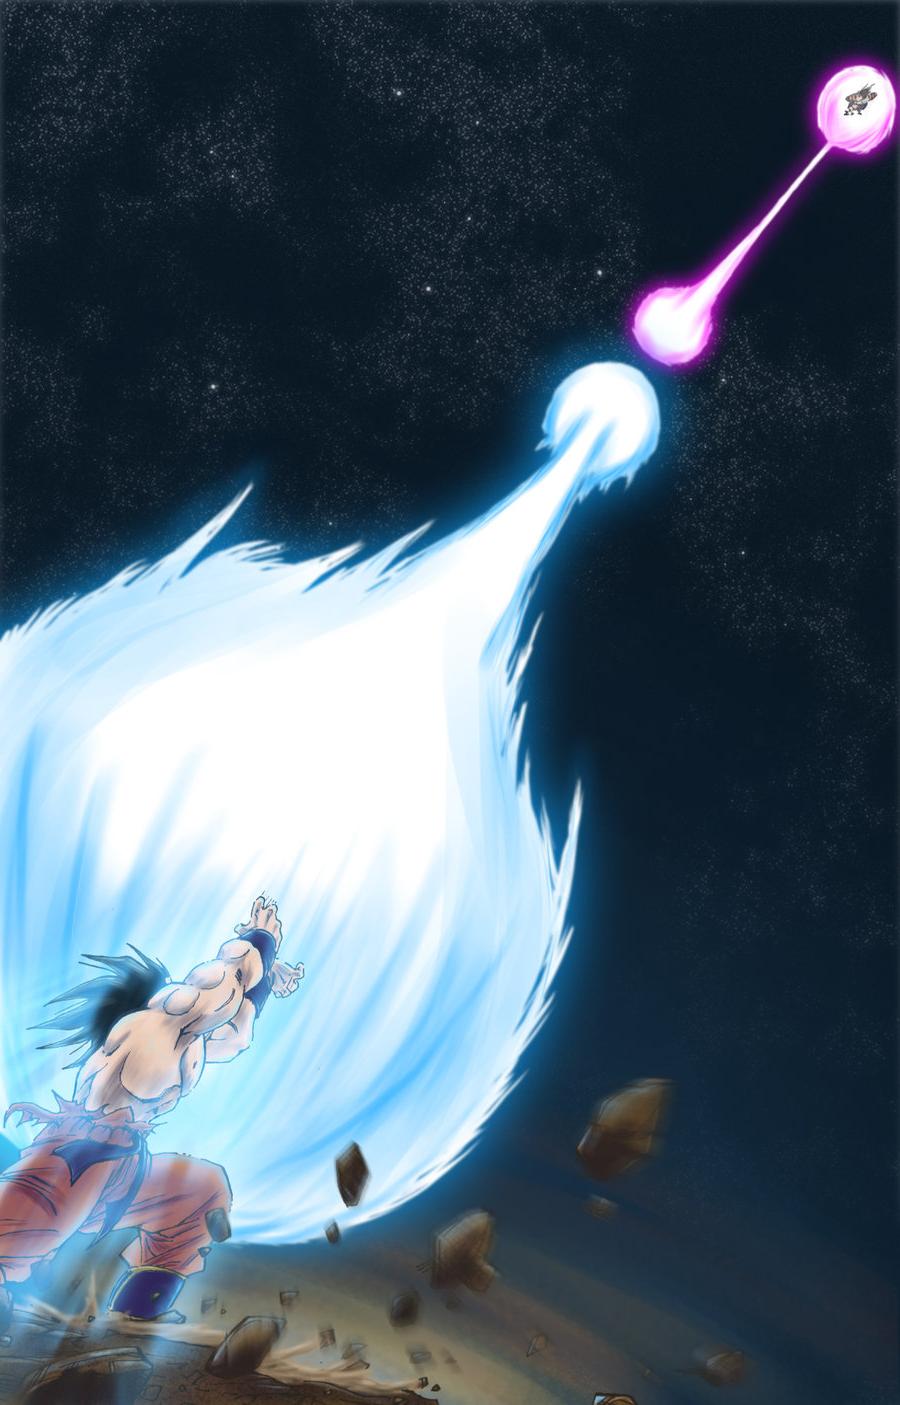 Goku Kamehameha Vs Vegeta Galick Gun Kamehameha vs galick gun 900x1405